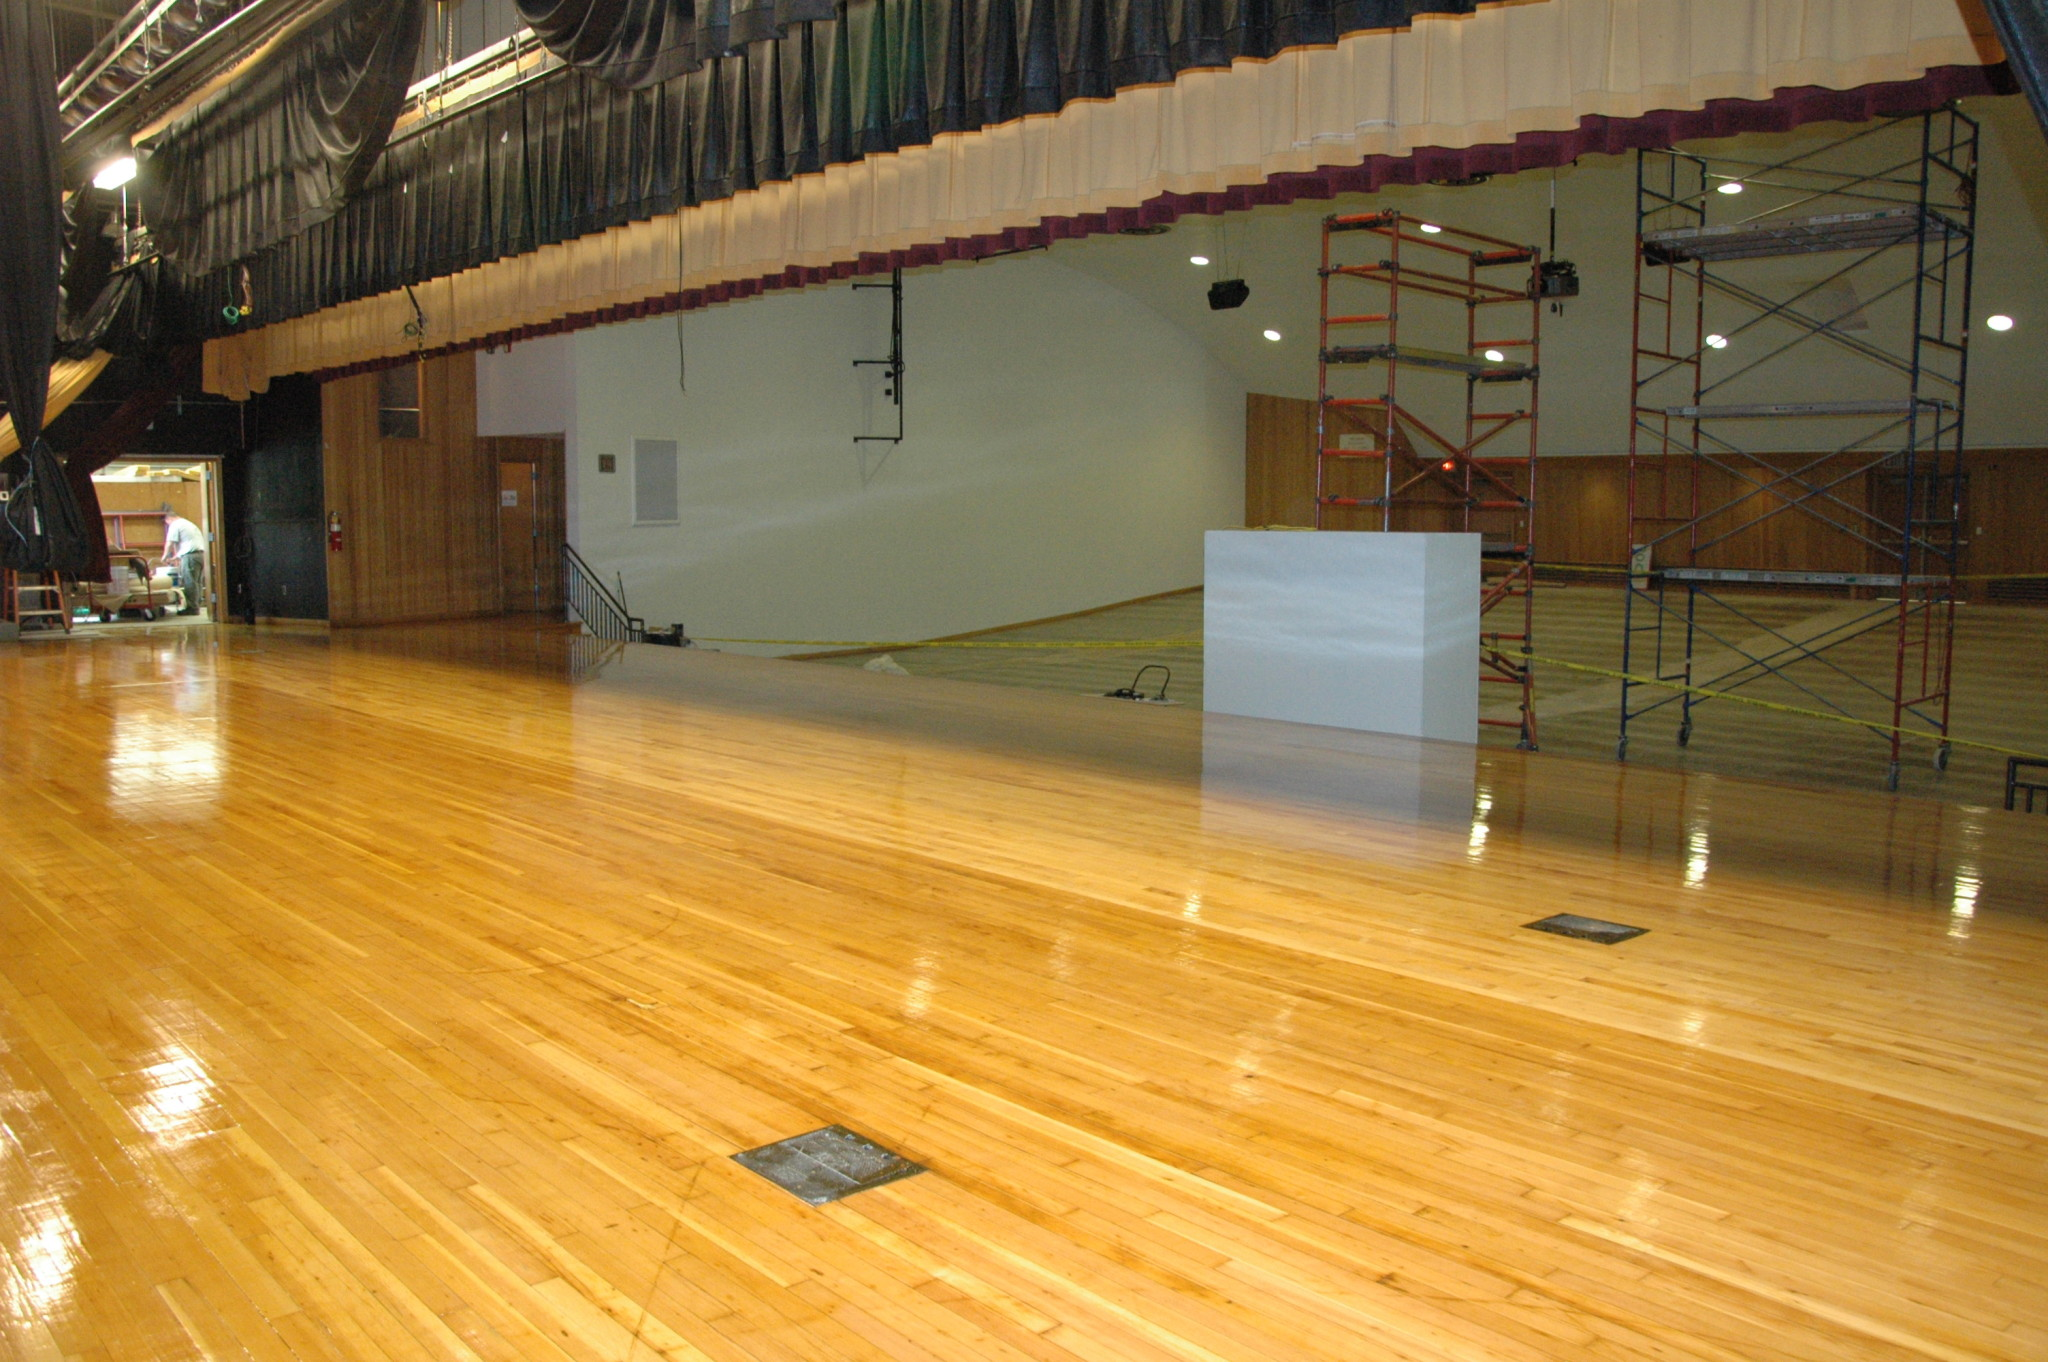 Auditorium renovations on target